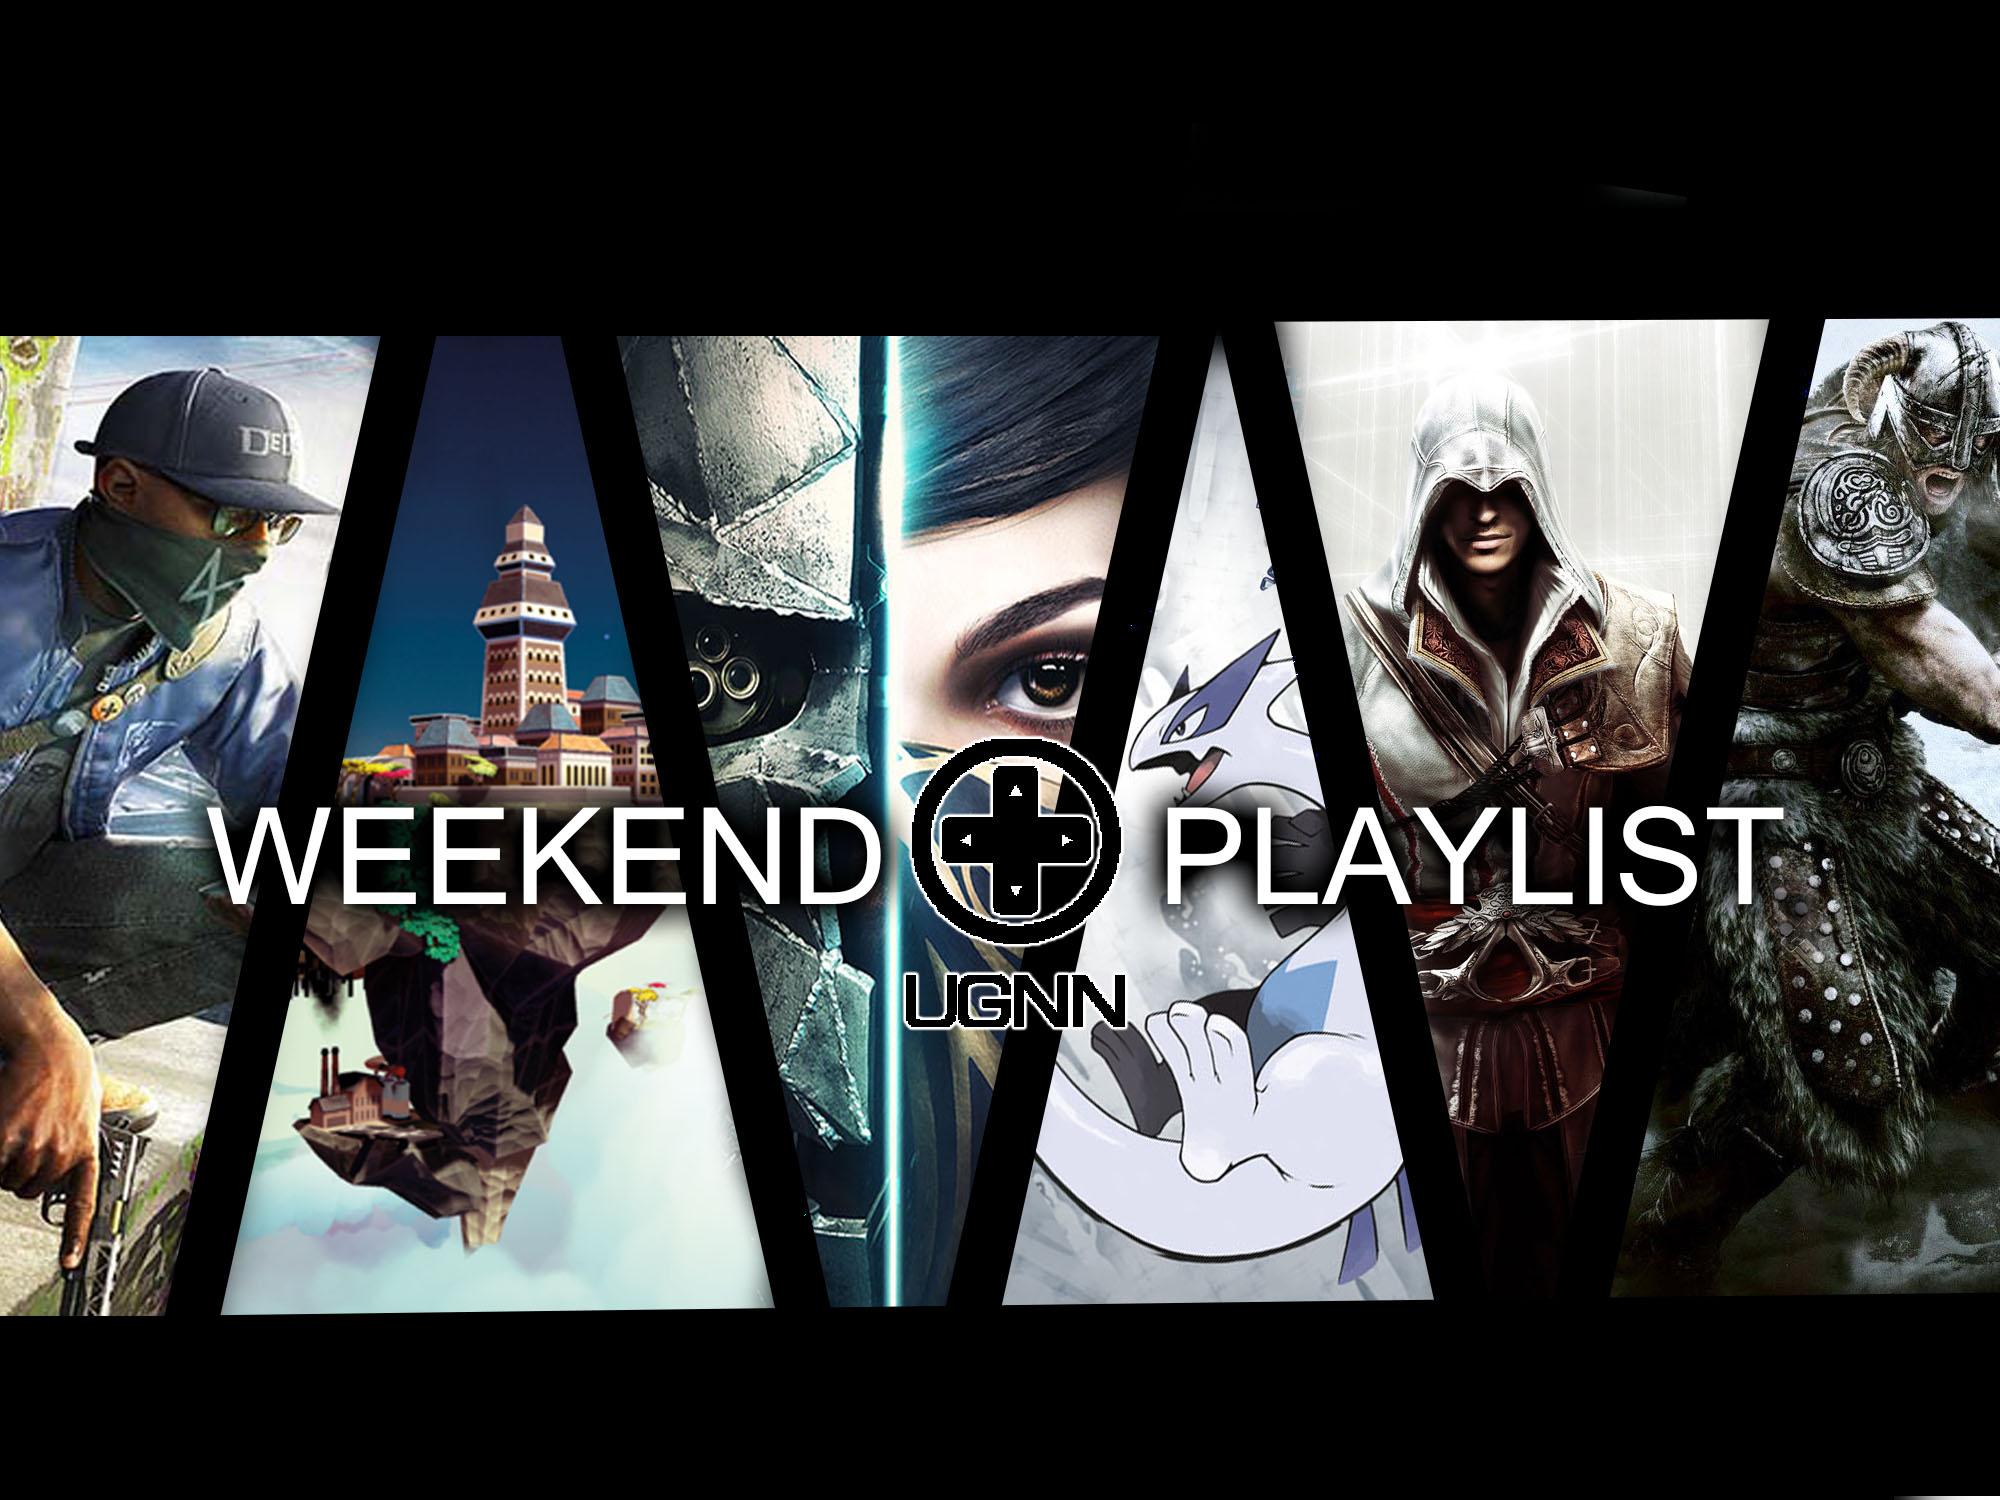 ugnn-weekened-playlist-2